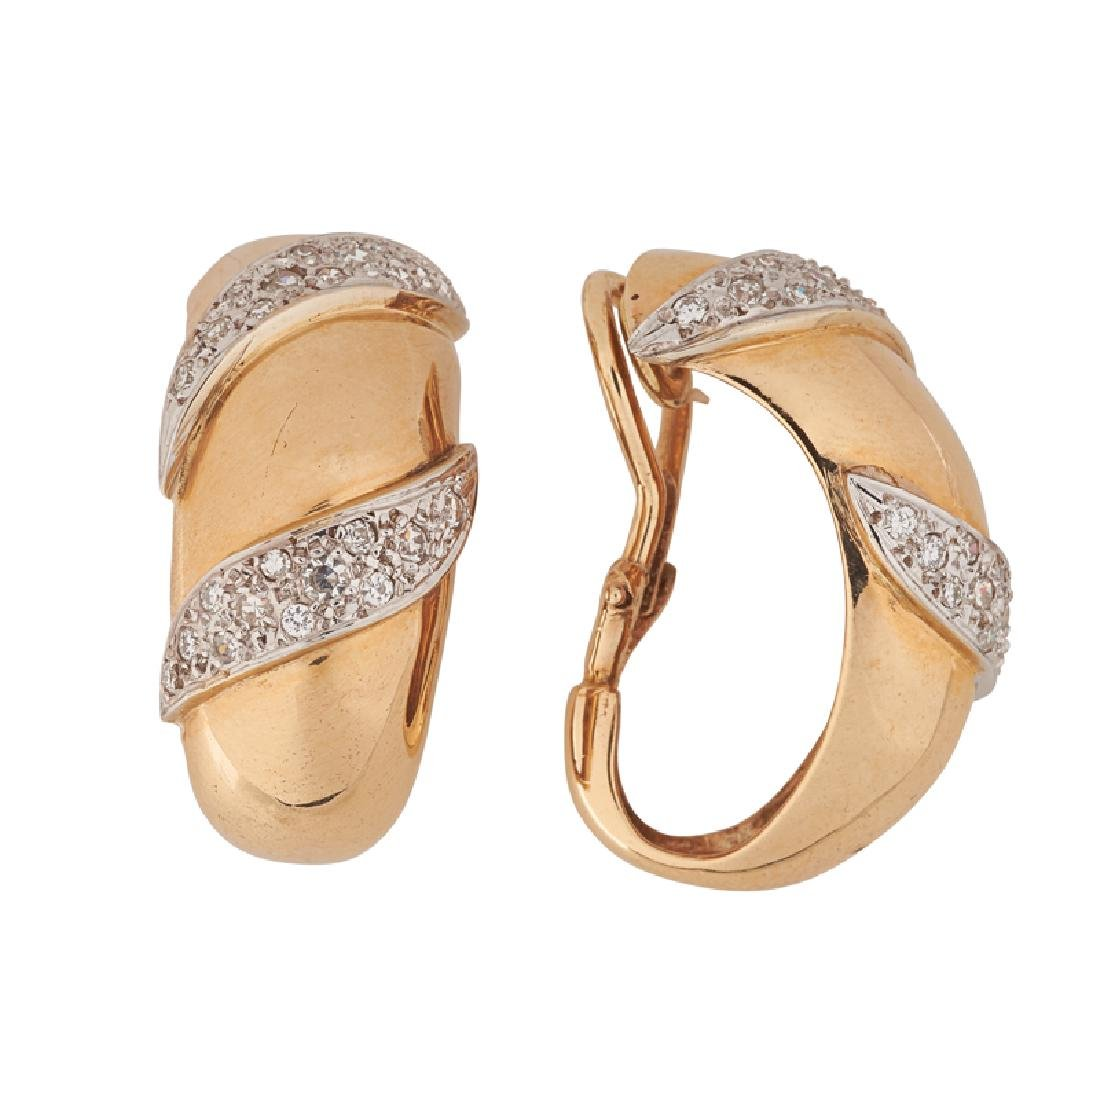 DIAMOND & YELLOW GOLD EAR CLIPS